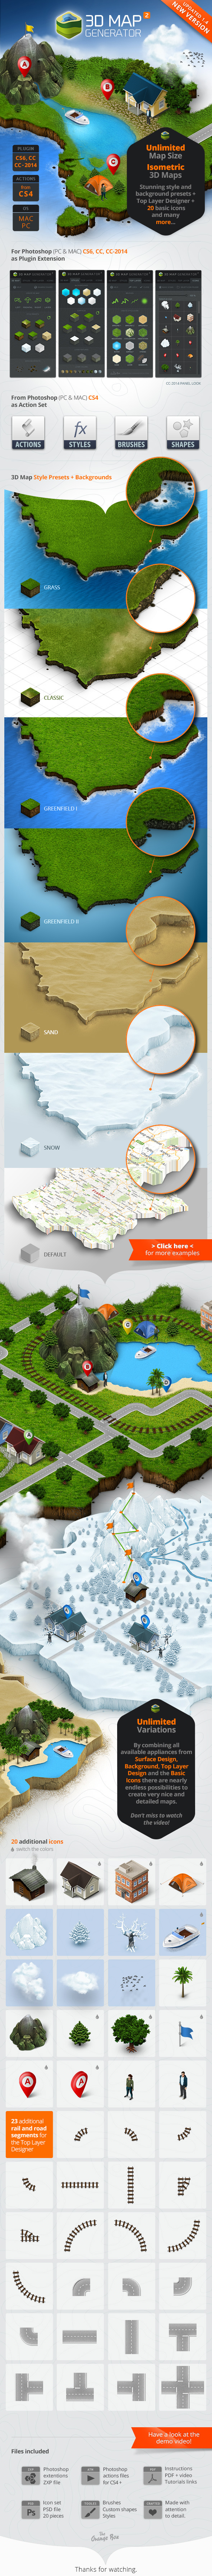 3D Map Generator 2 - Isometric - Utilities Actions